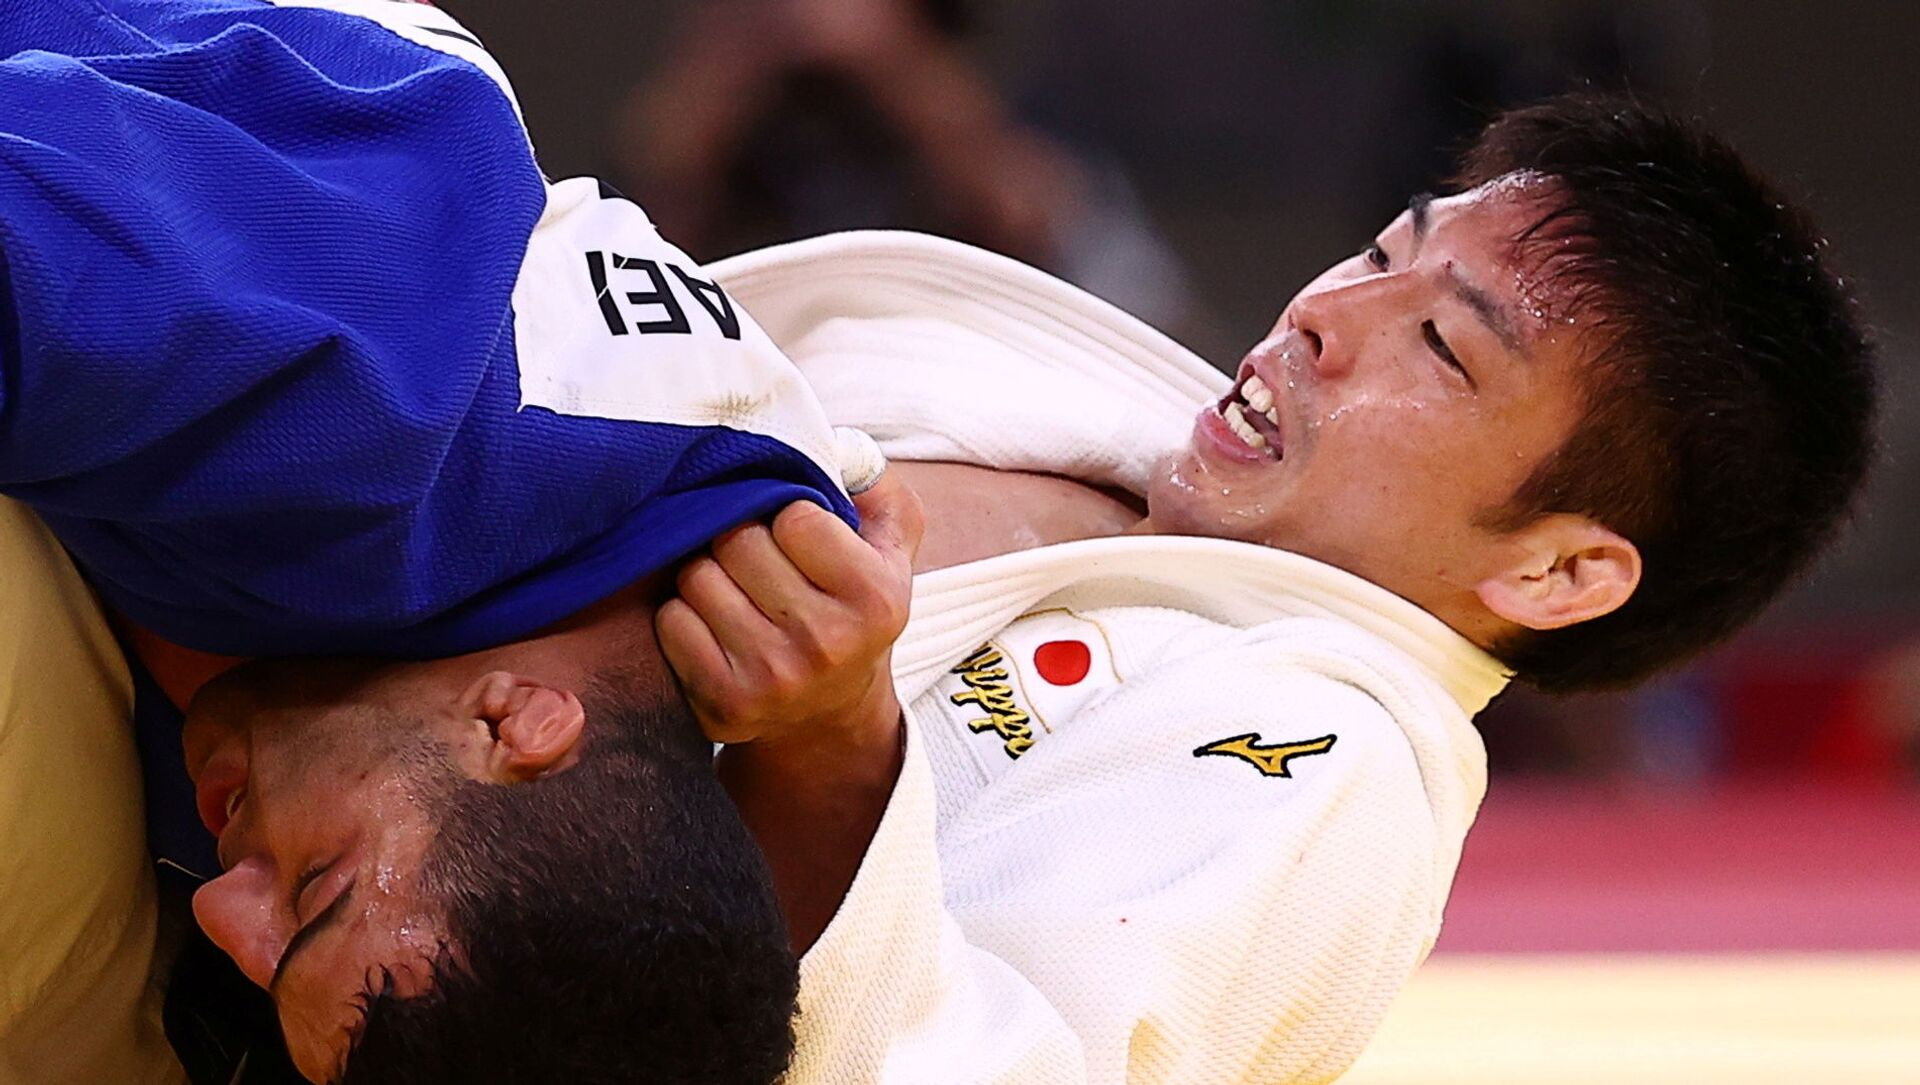 Tokyo 2020 Olympics - Judo - Men's 81kg - Gold medal match - Nippon Budokan - Tokyo, Japan - Sputnik International, 1920, 27.07.2021